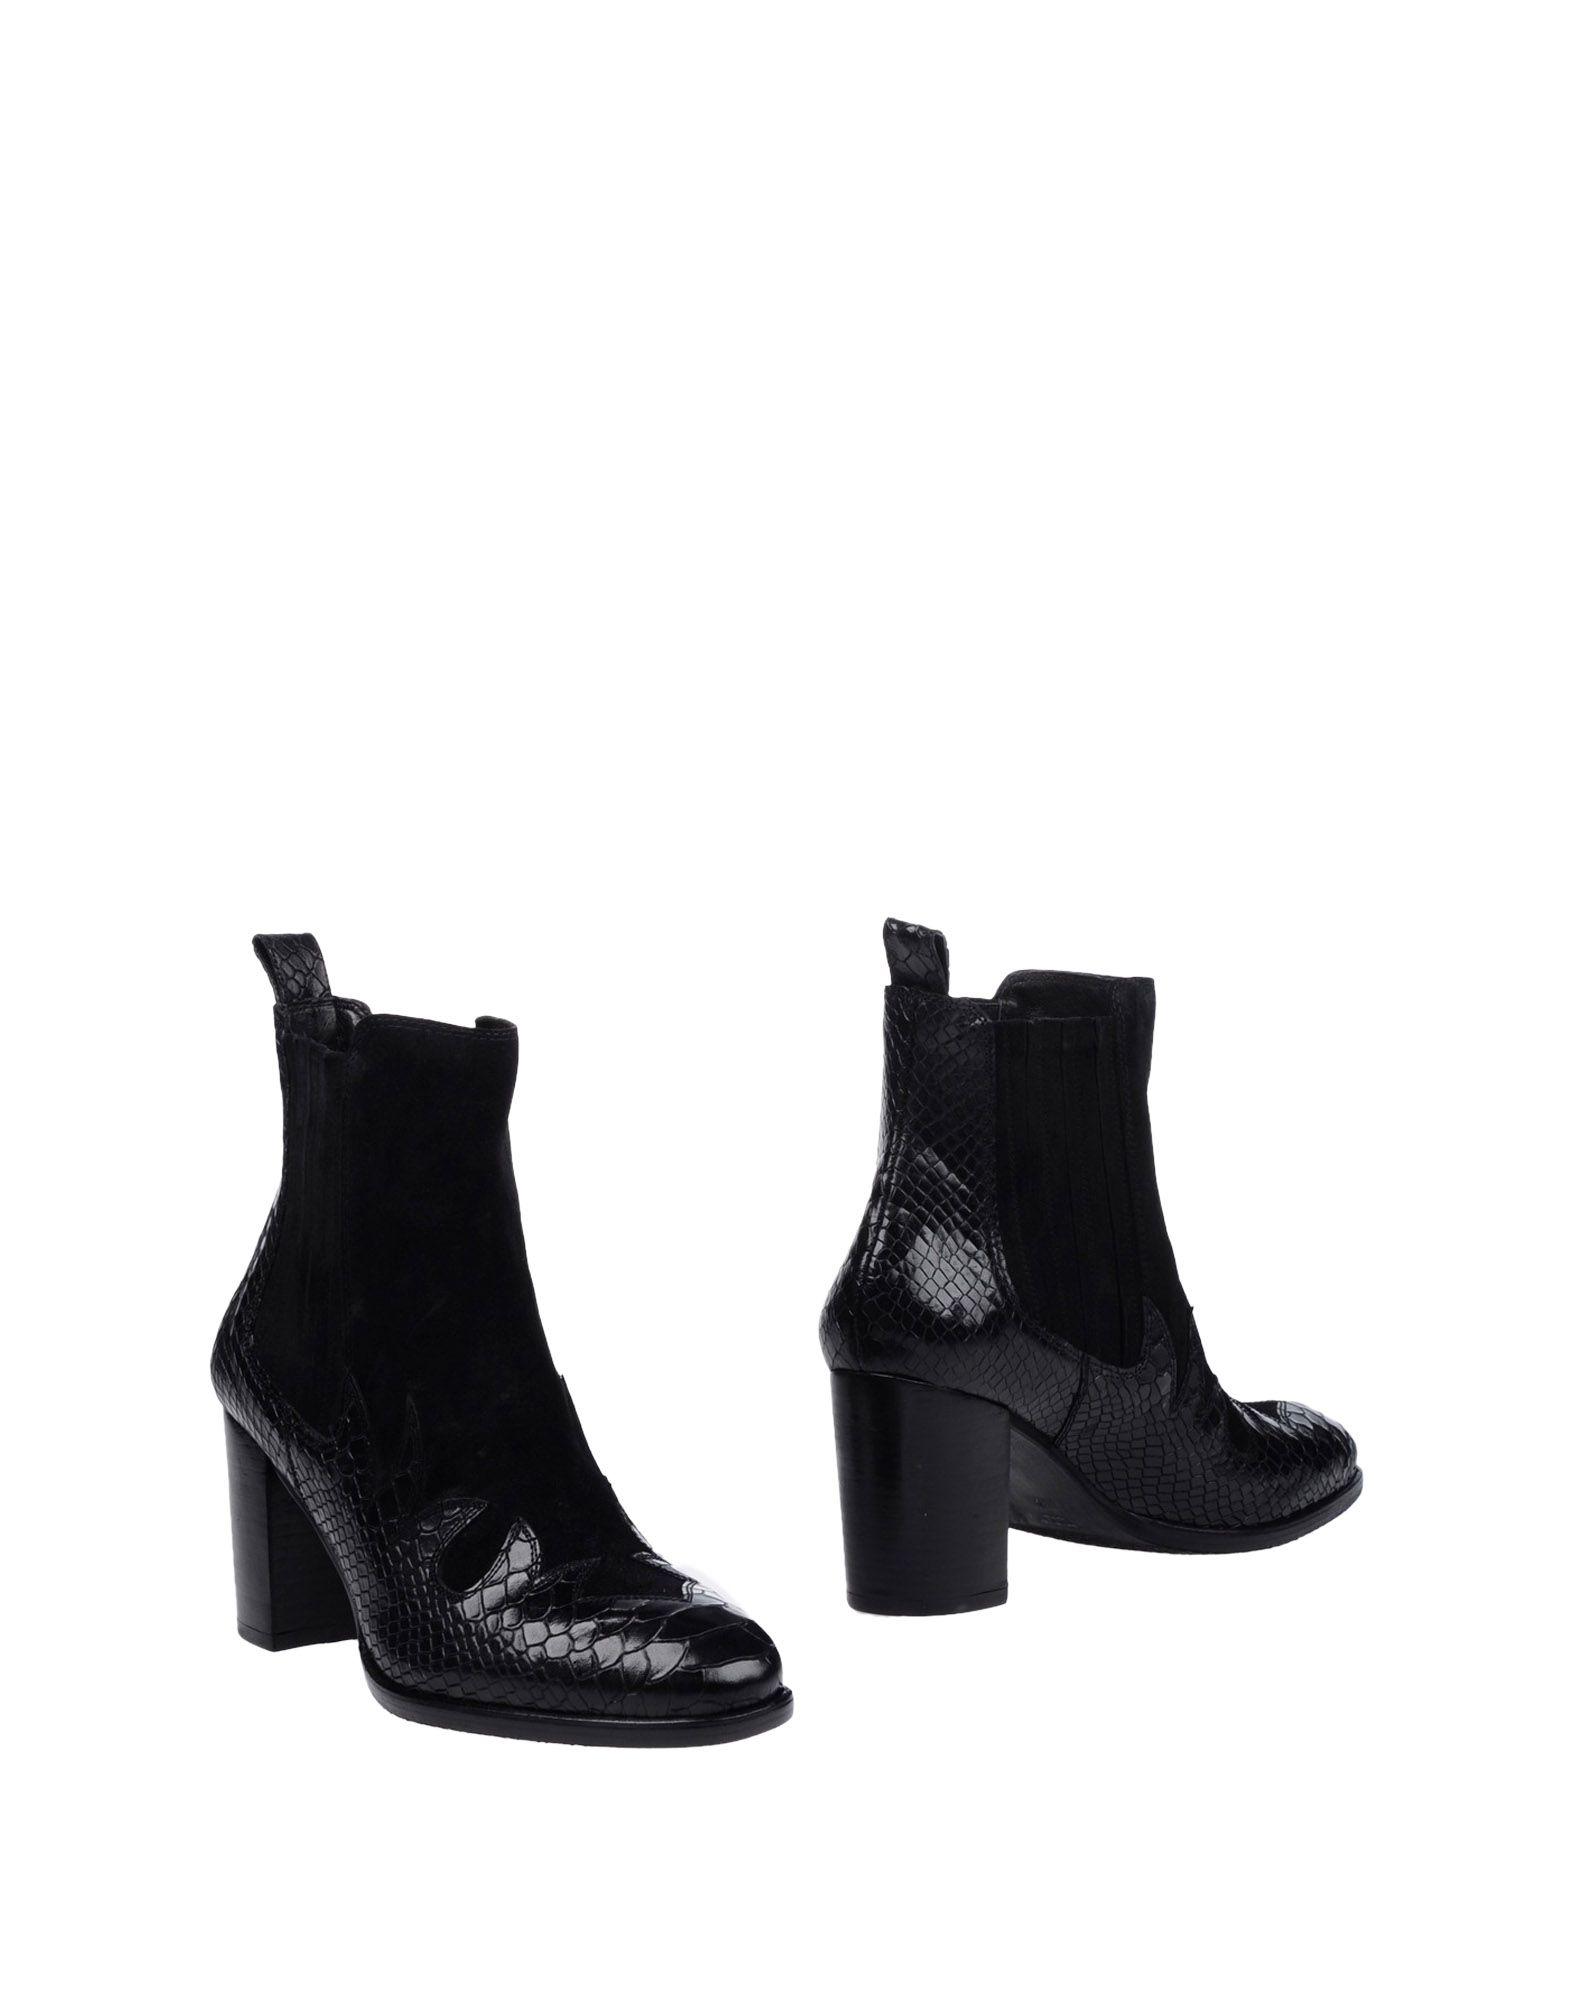 ZINDA Полусапоги и высокие ботинки magazzini del sale полусапоги и высокие ботинки